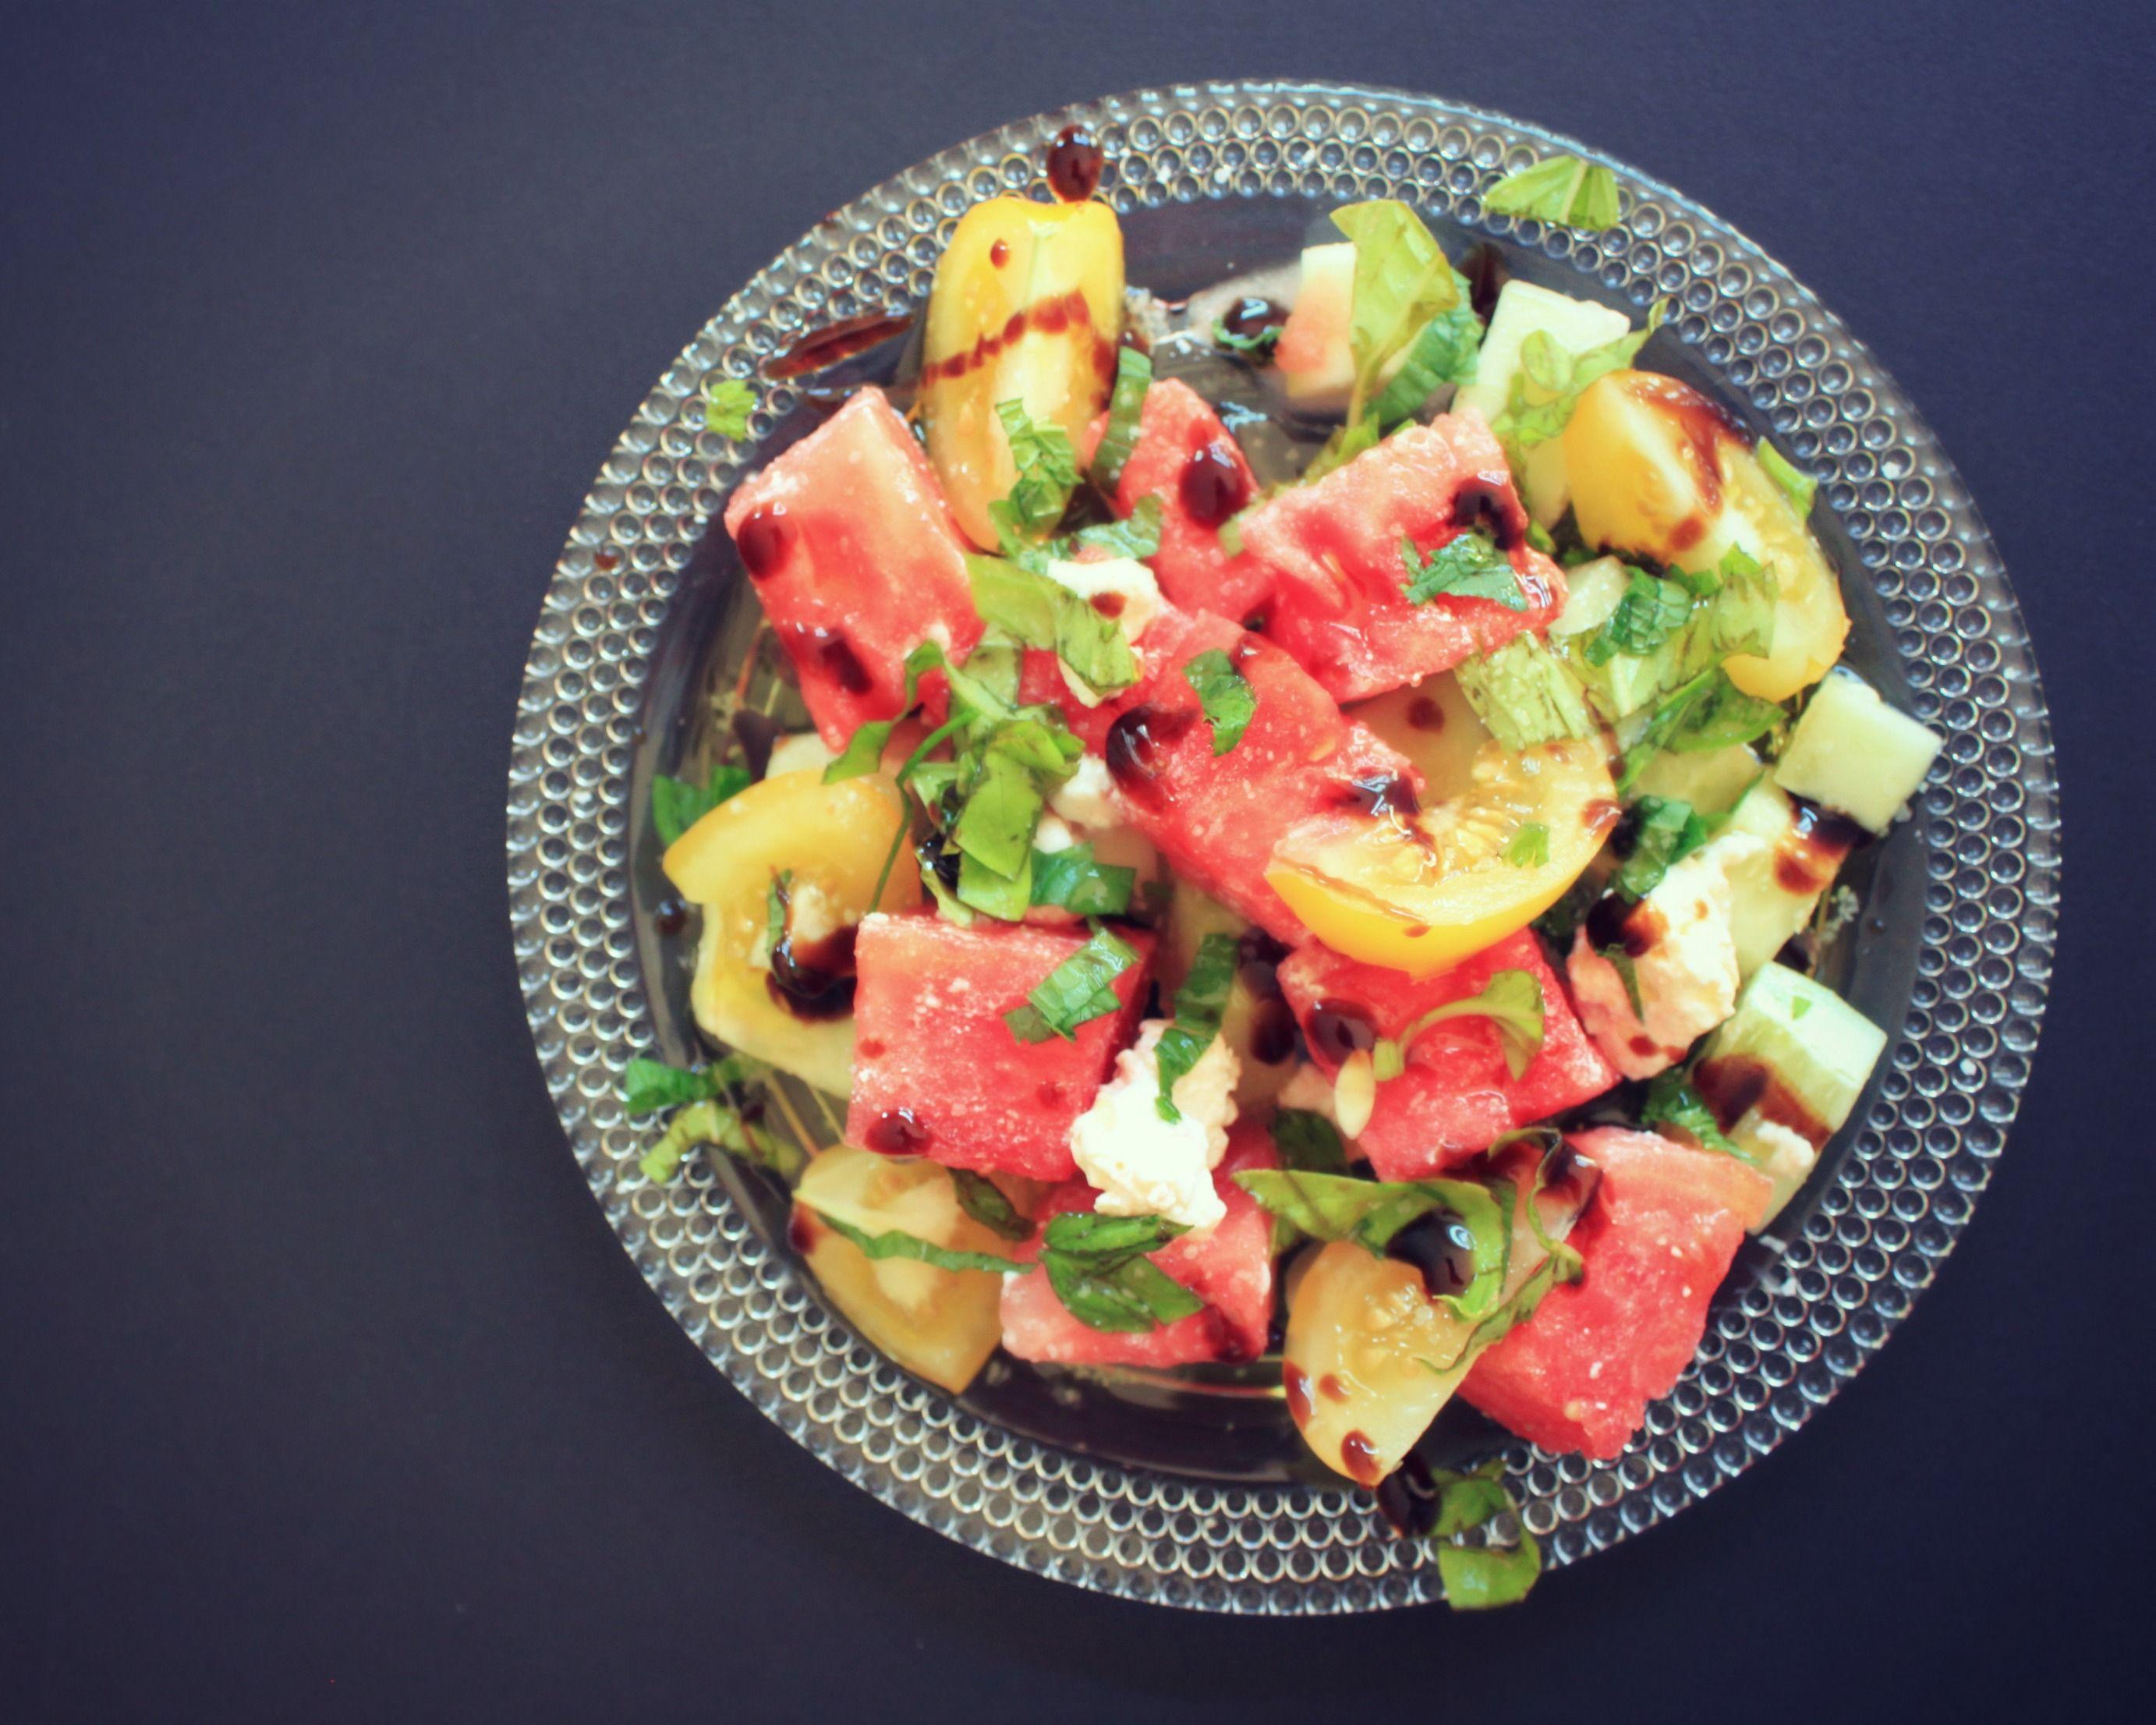 watermelon & feta summer salad...mmm...